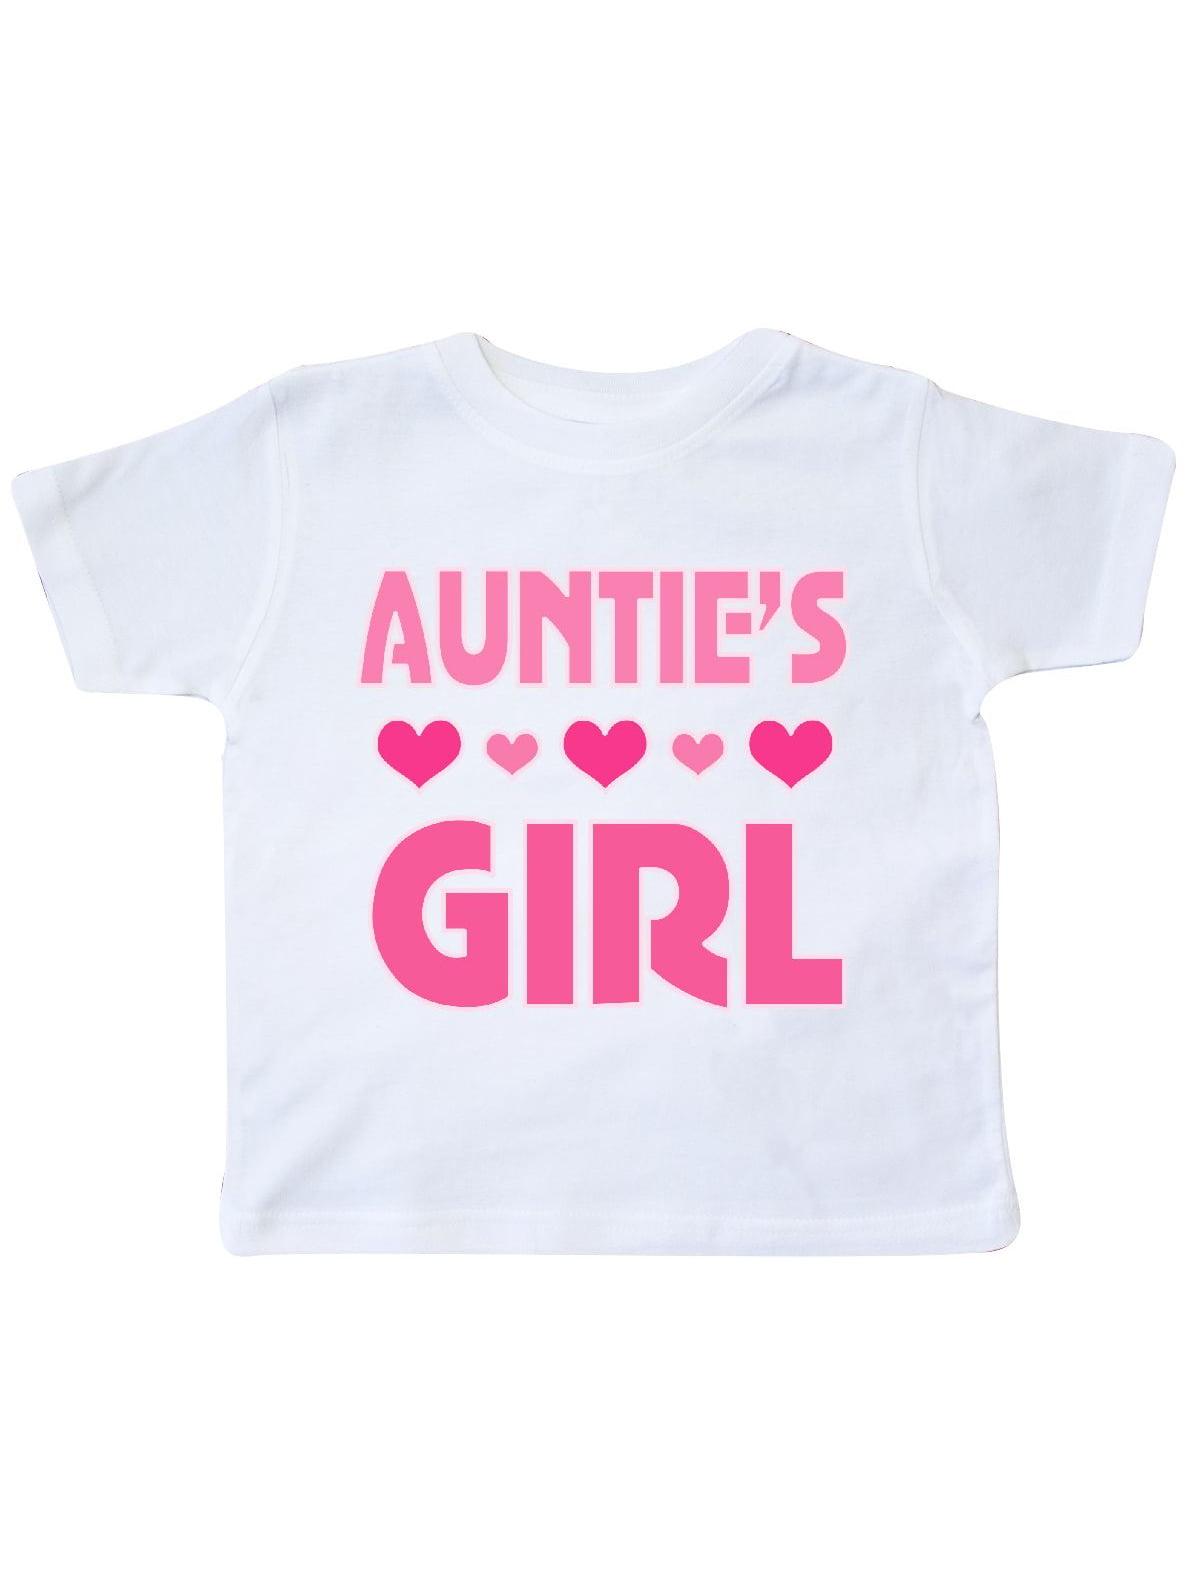 Auntie Girl Niece Gift Toddler T-Shirt